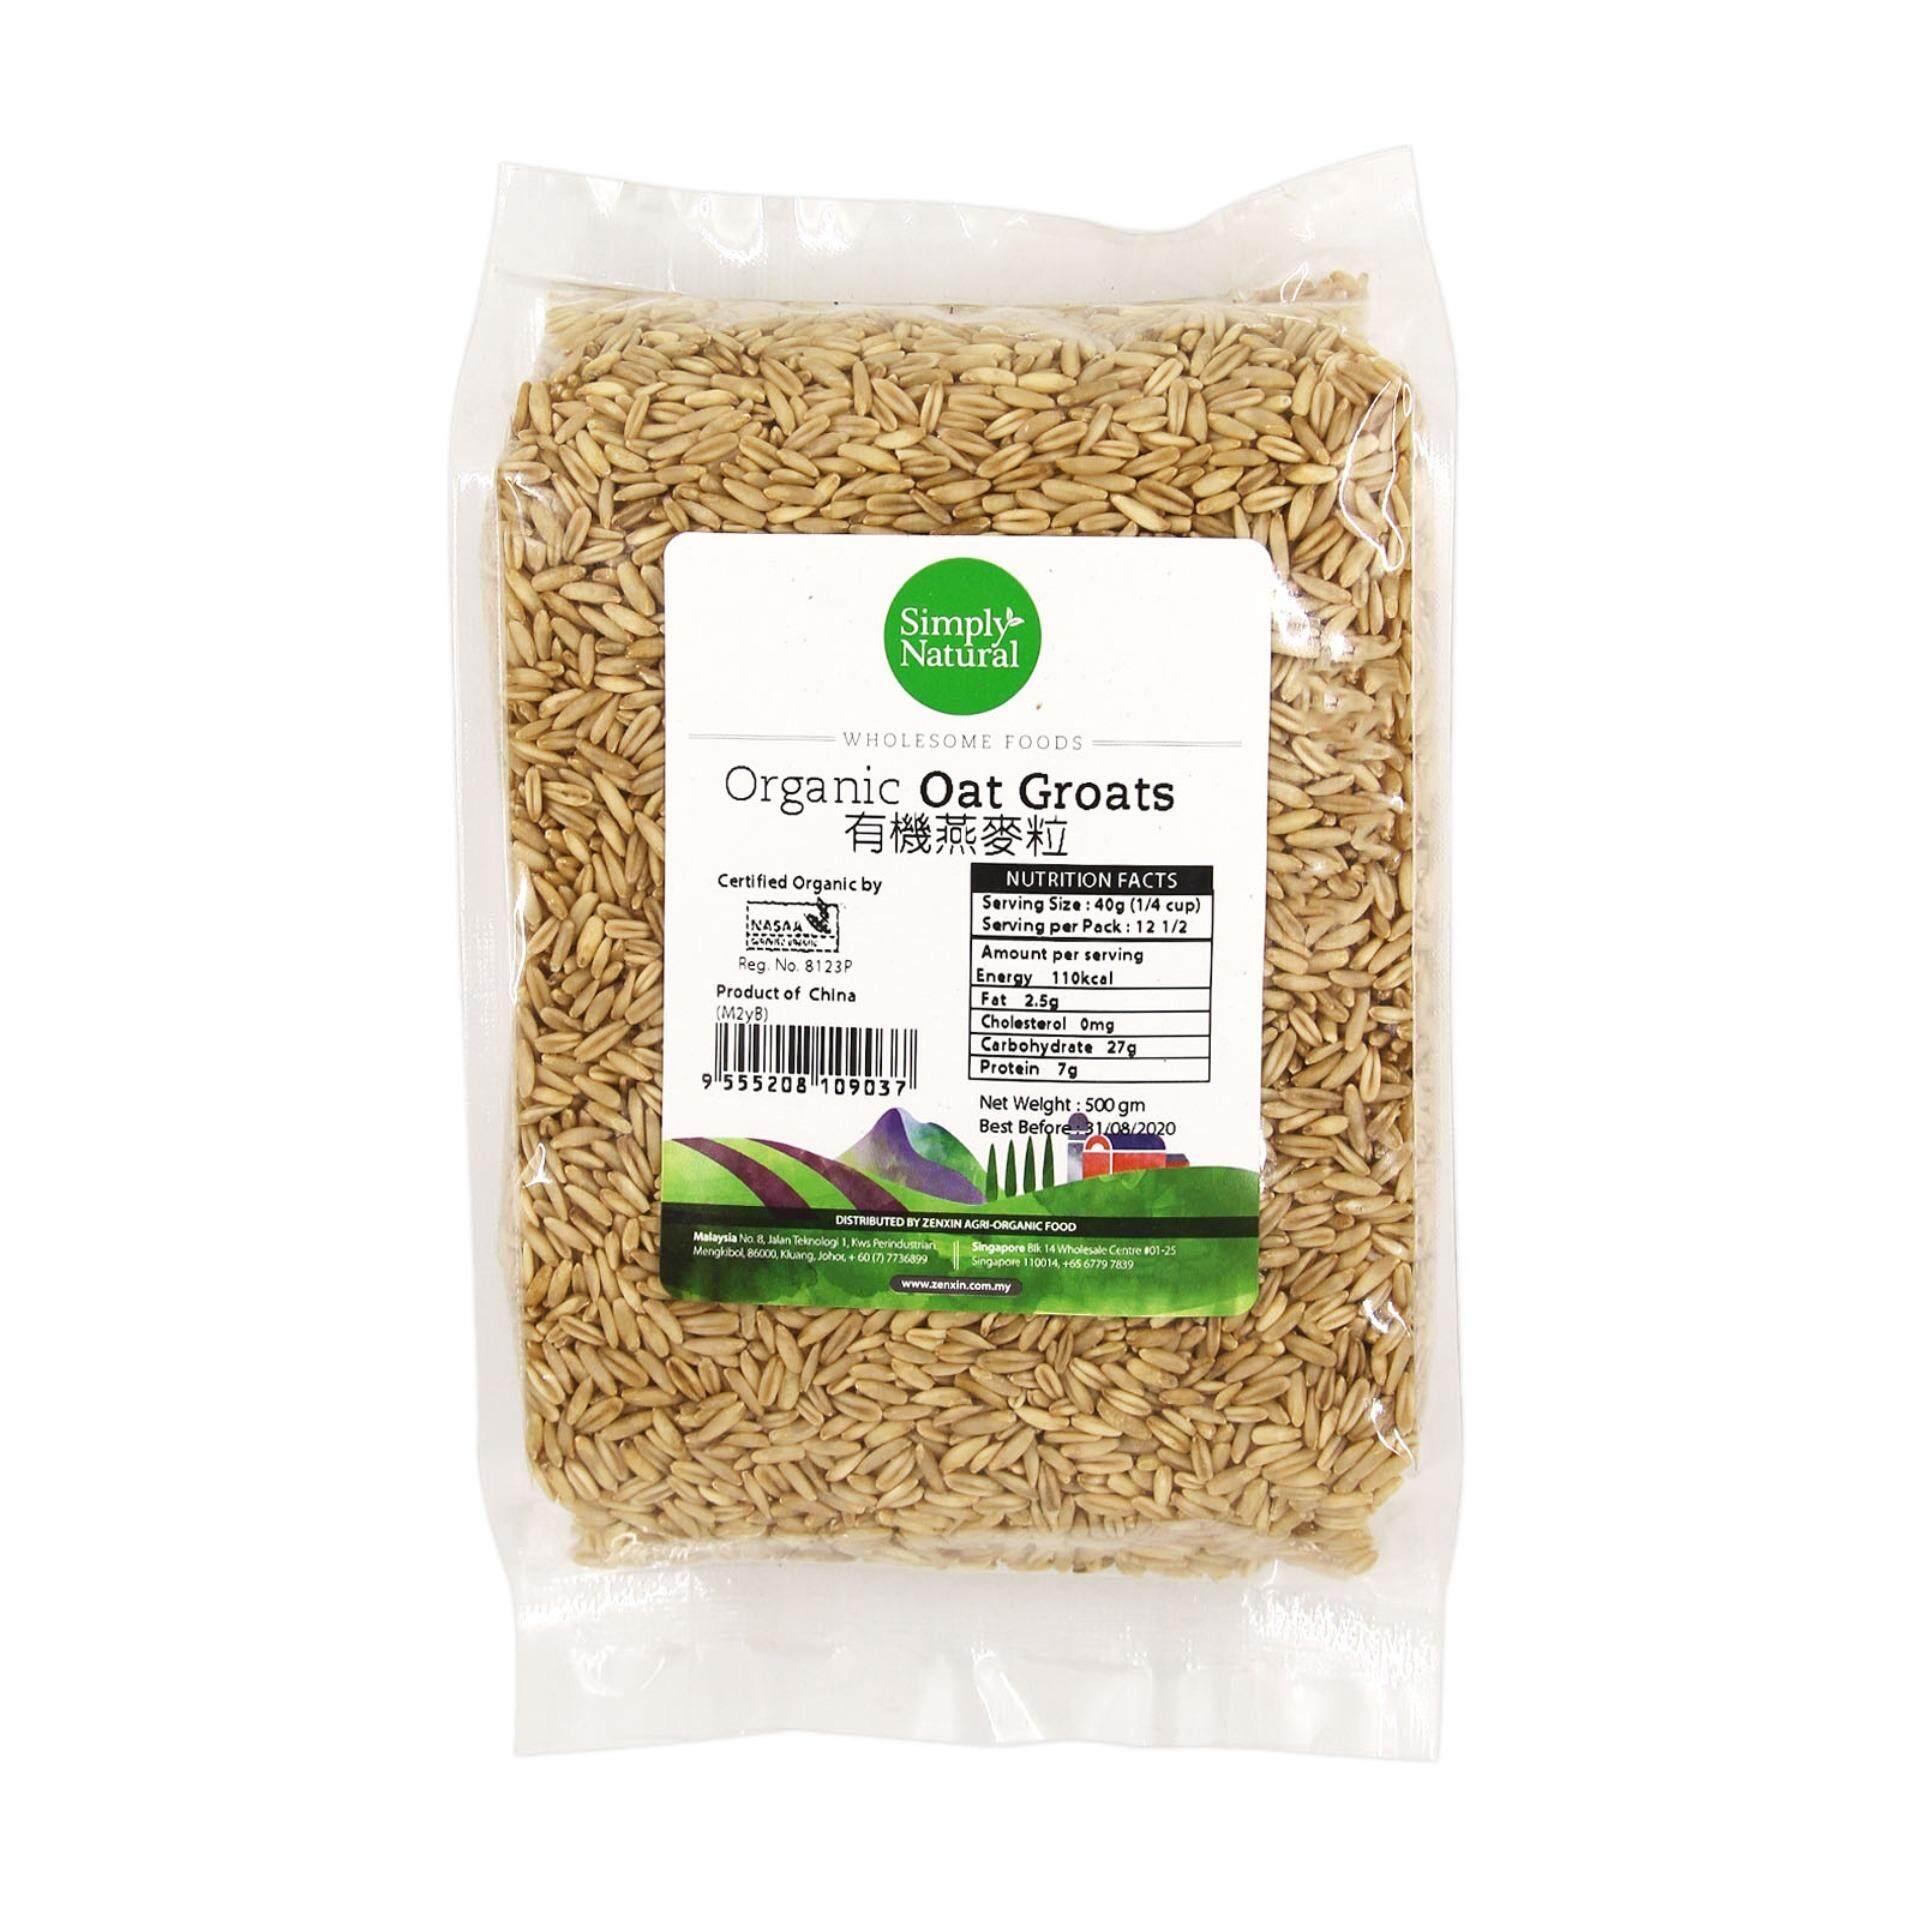 SIMPLY NATURAL Organic Oat Groats 500g China